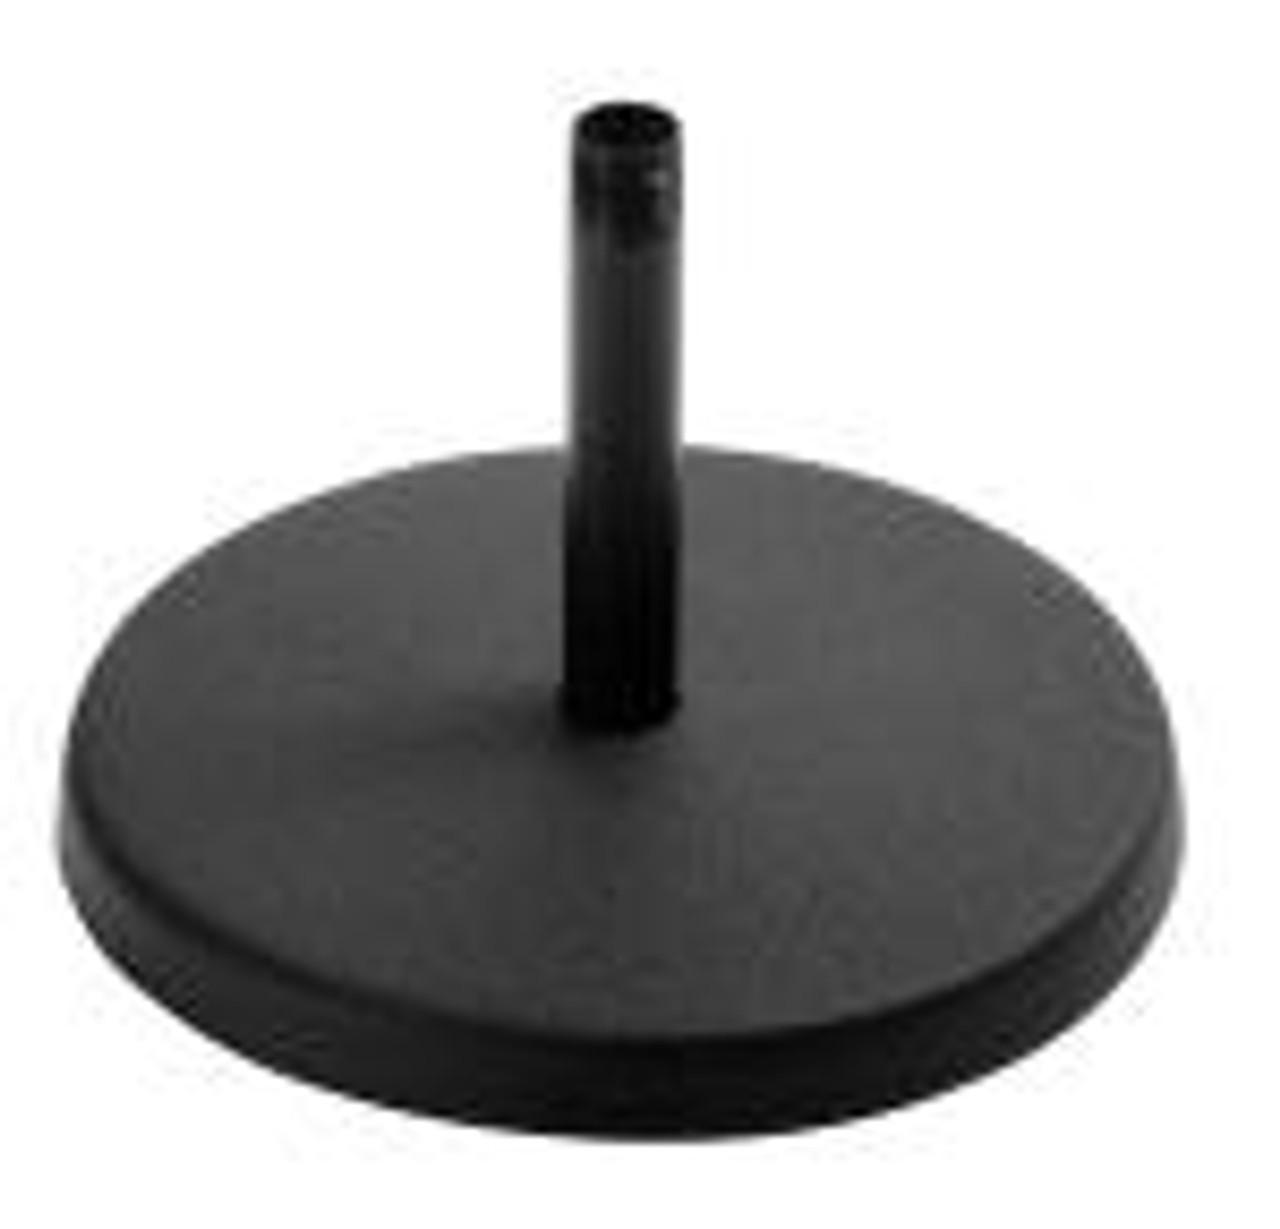 Desk Stand -  Black